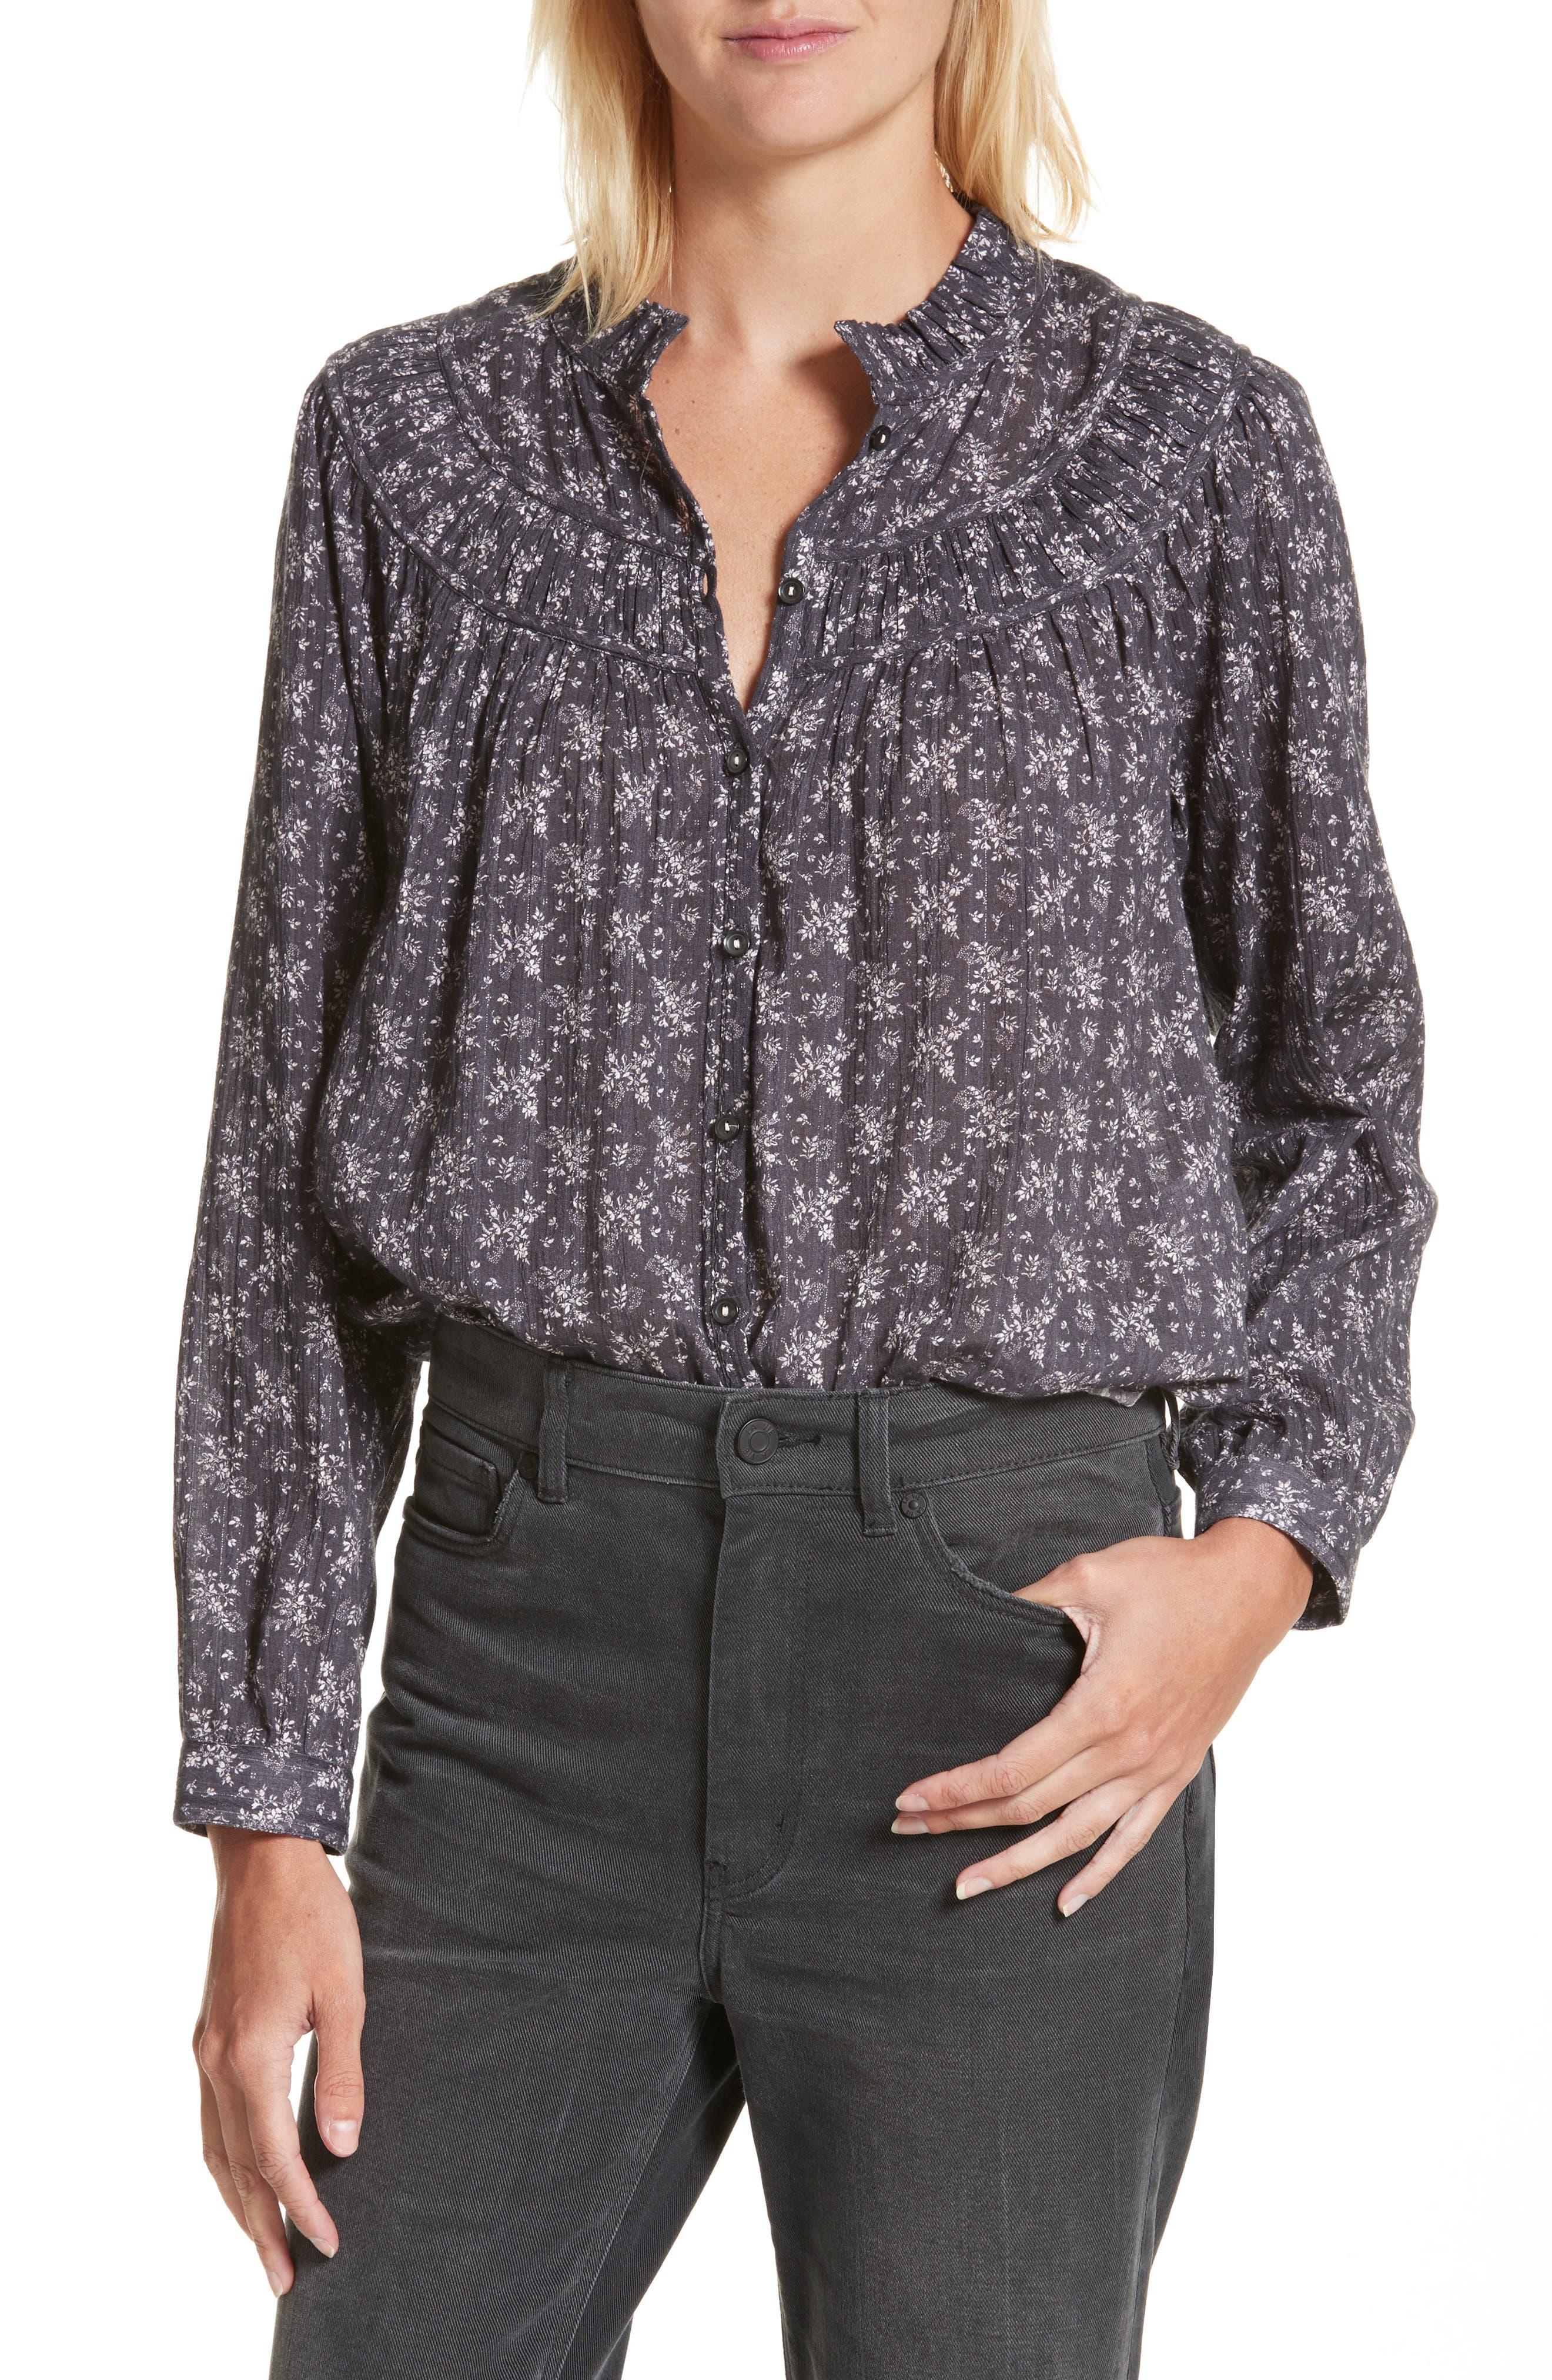 Angelique Long Sleeve Top,                         Main,                         color, Black Combo